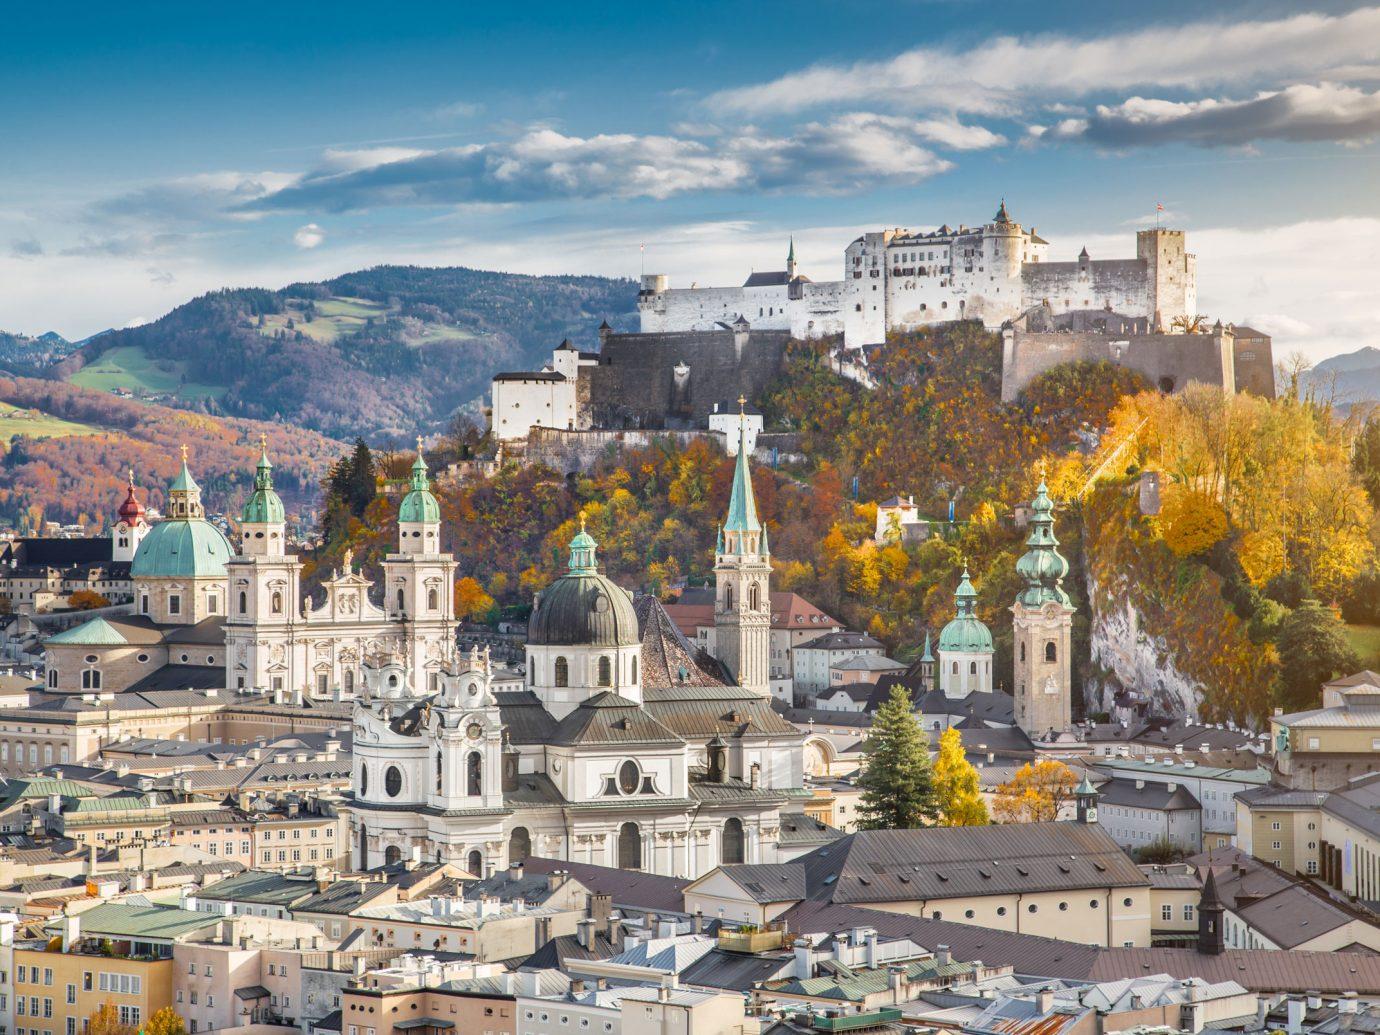 Salzburg, Austria in autumn